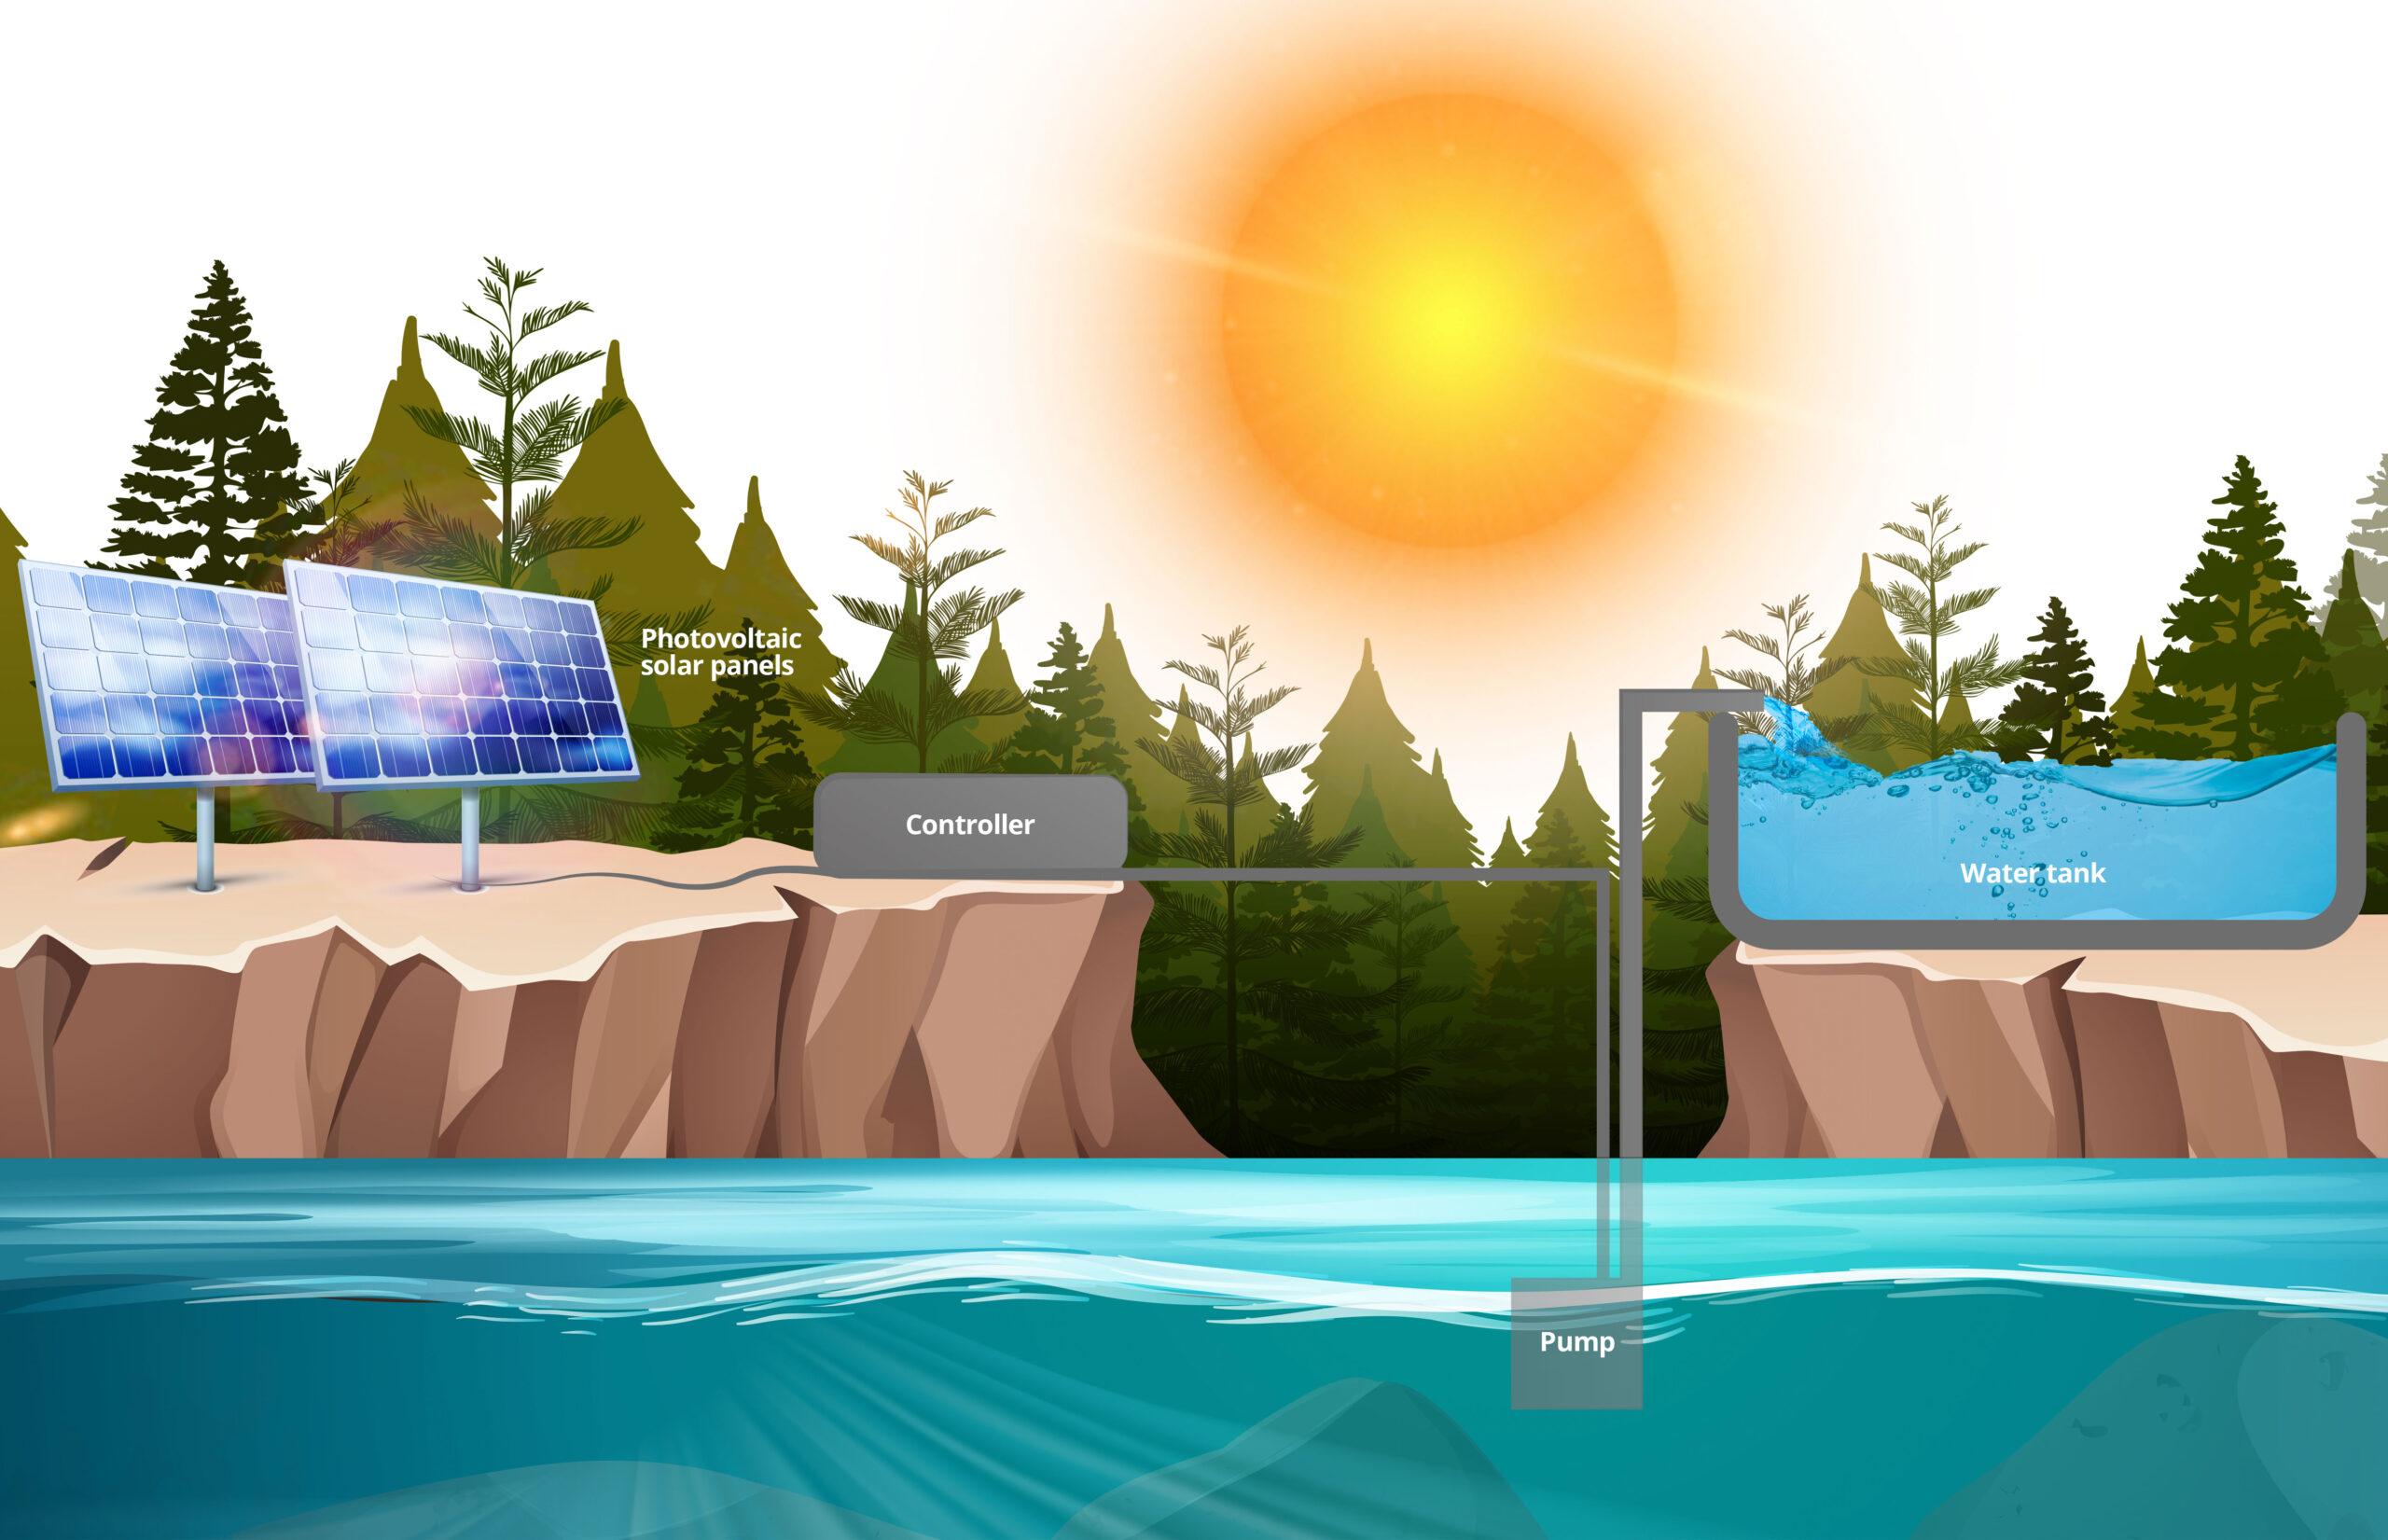 Pumping systems scheme